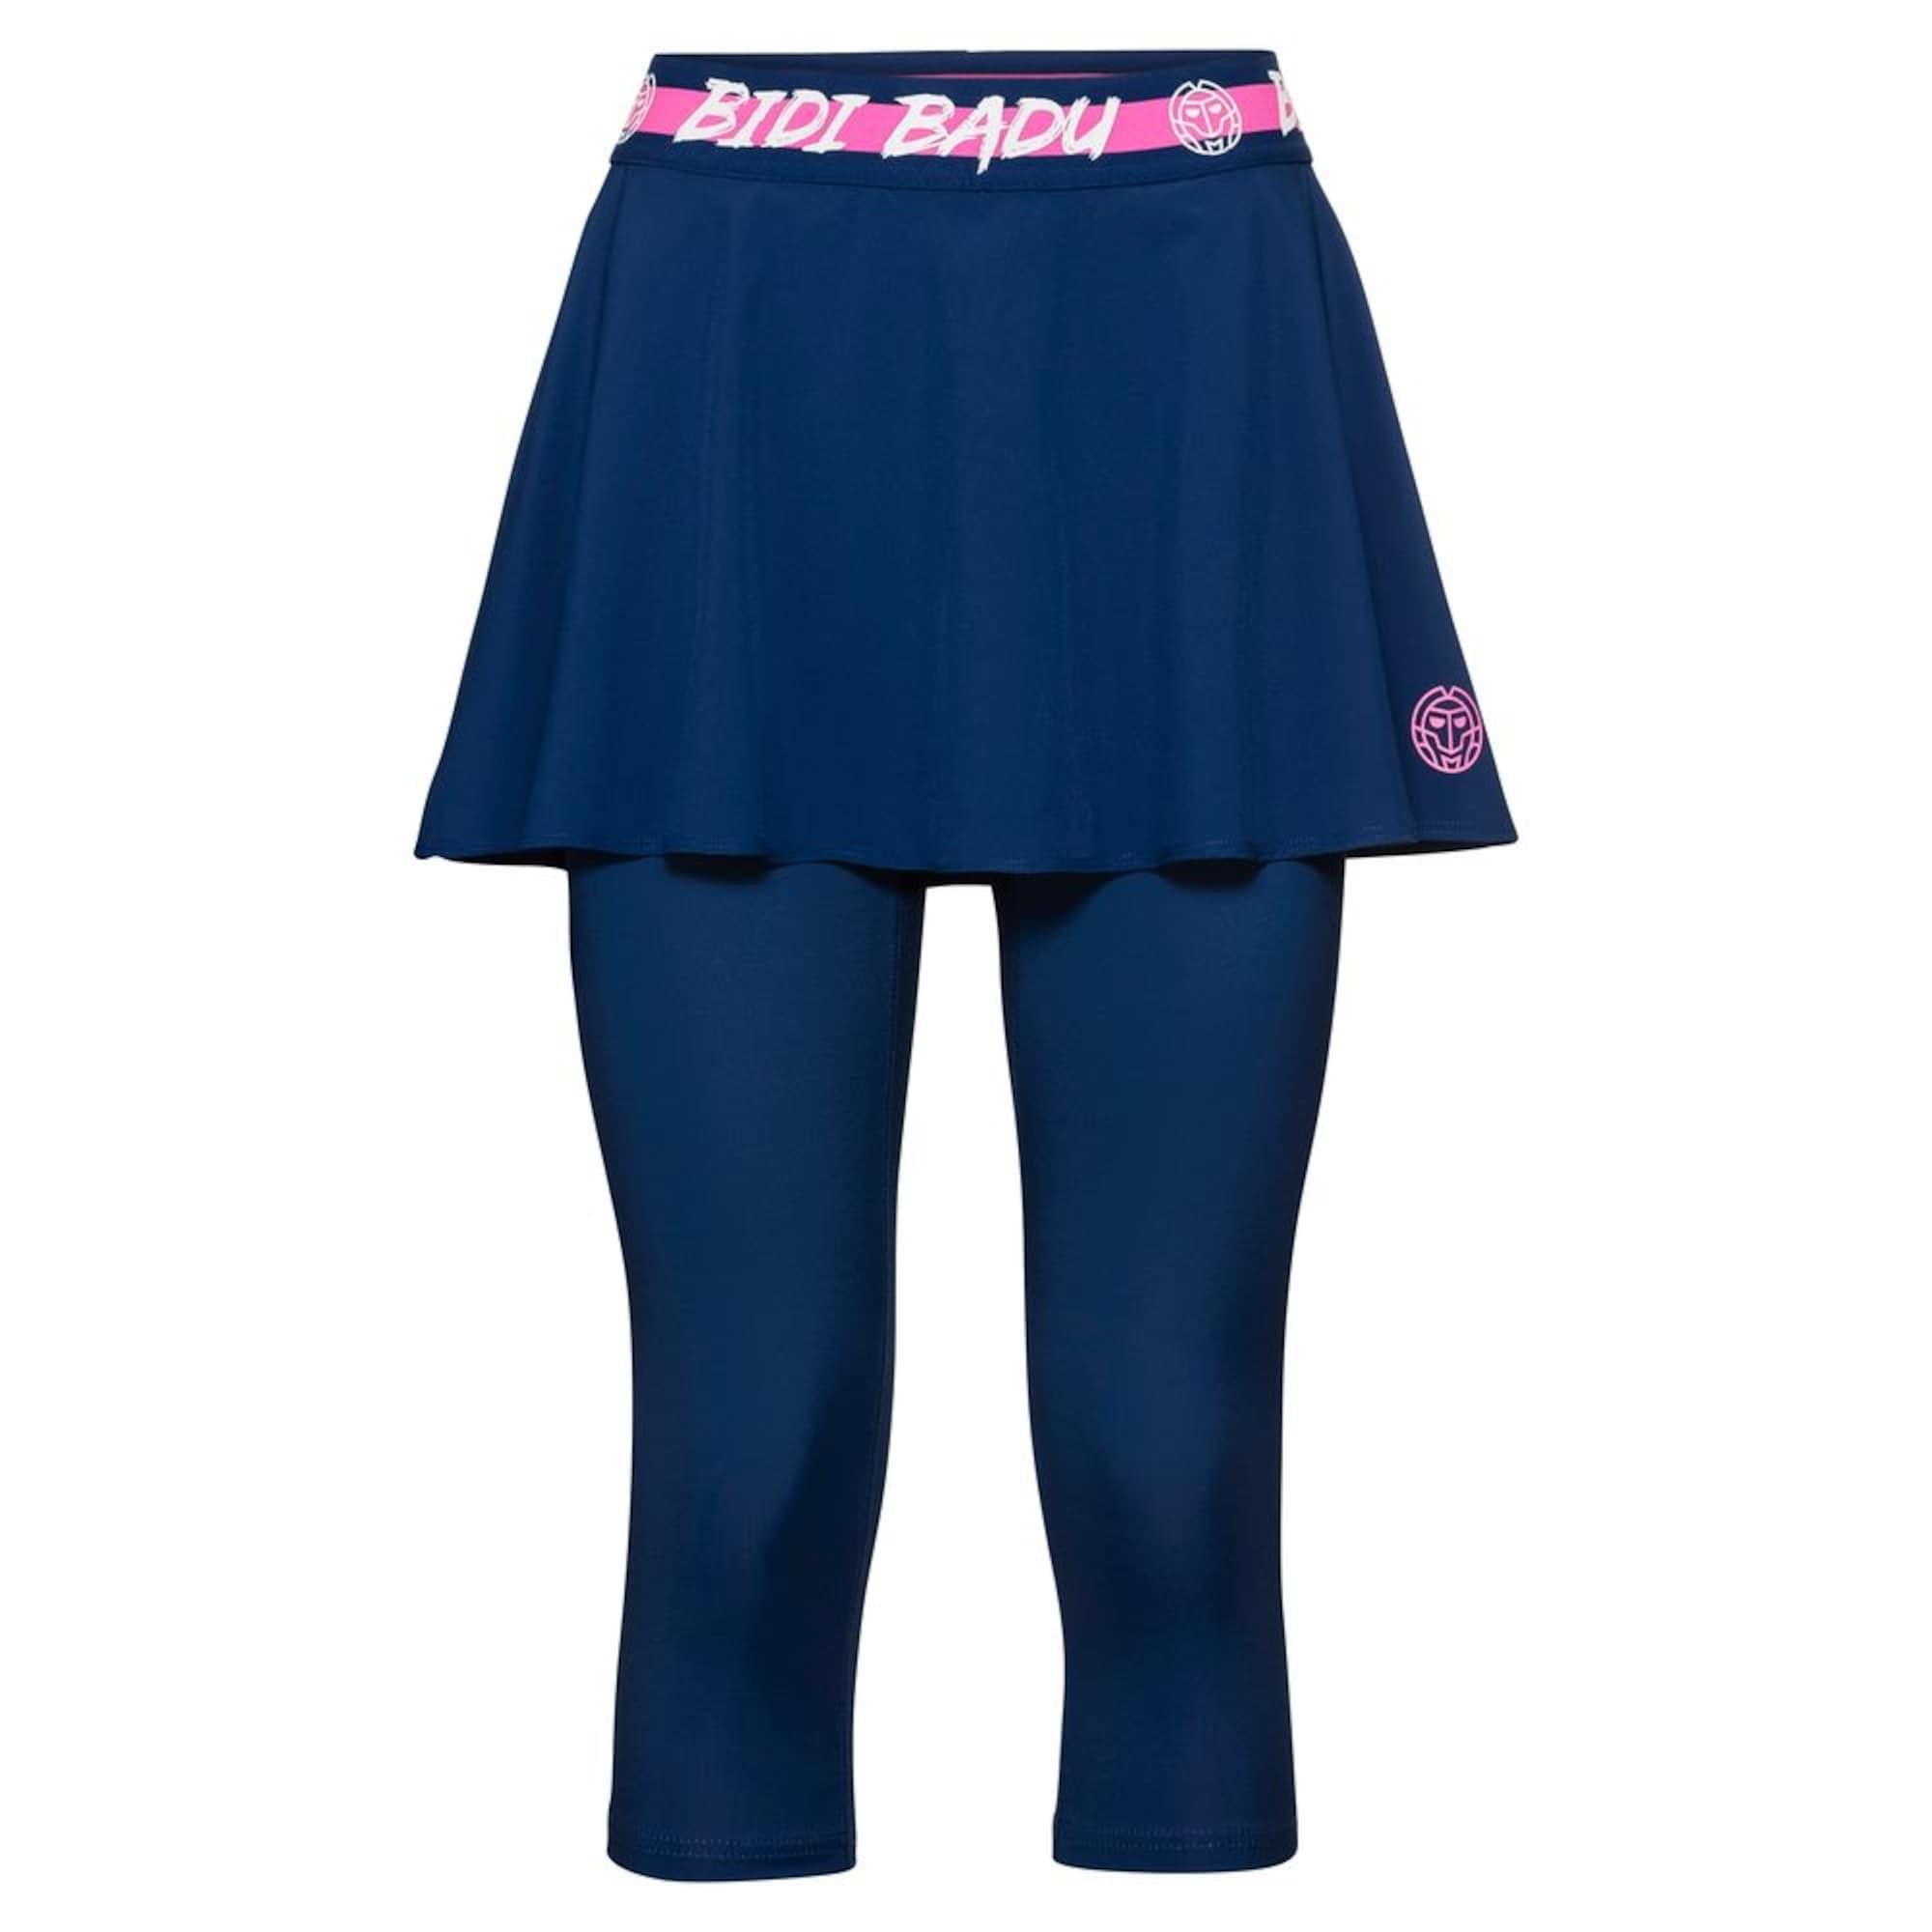 Tennisrock 'Faida' | Sportbekleidung > Sportröcke | BIDI BADU